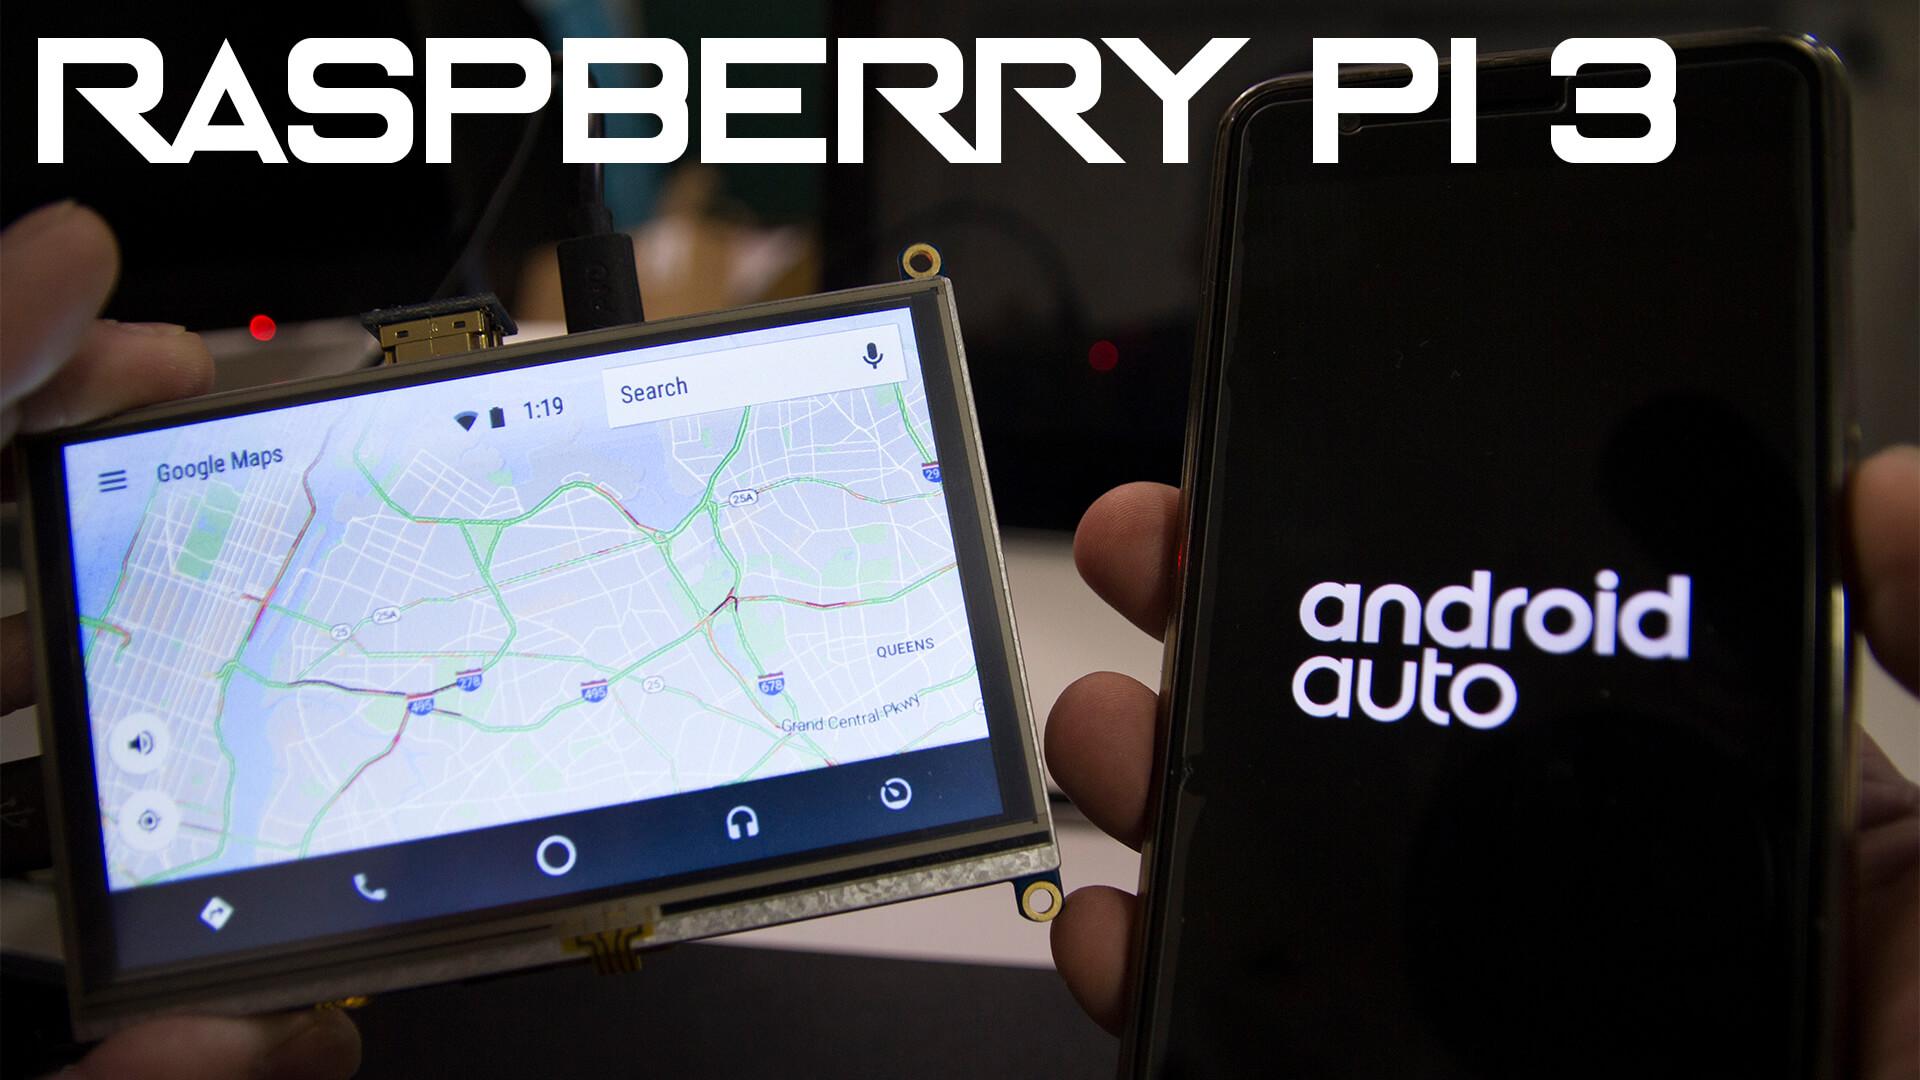 Android Auto on Raspberry Pi - Novaspirit